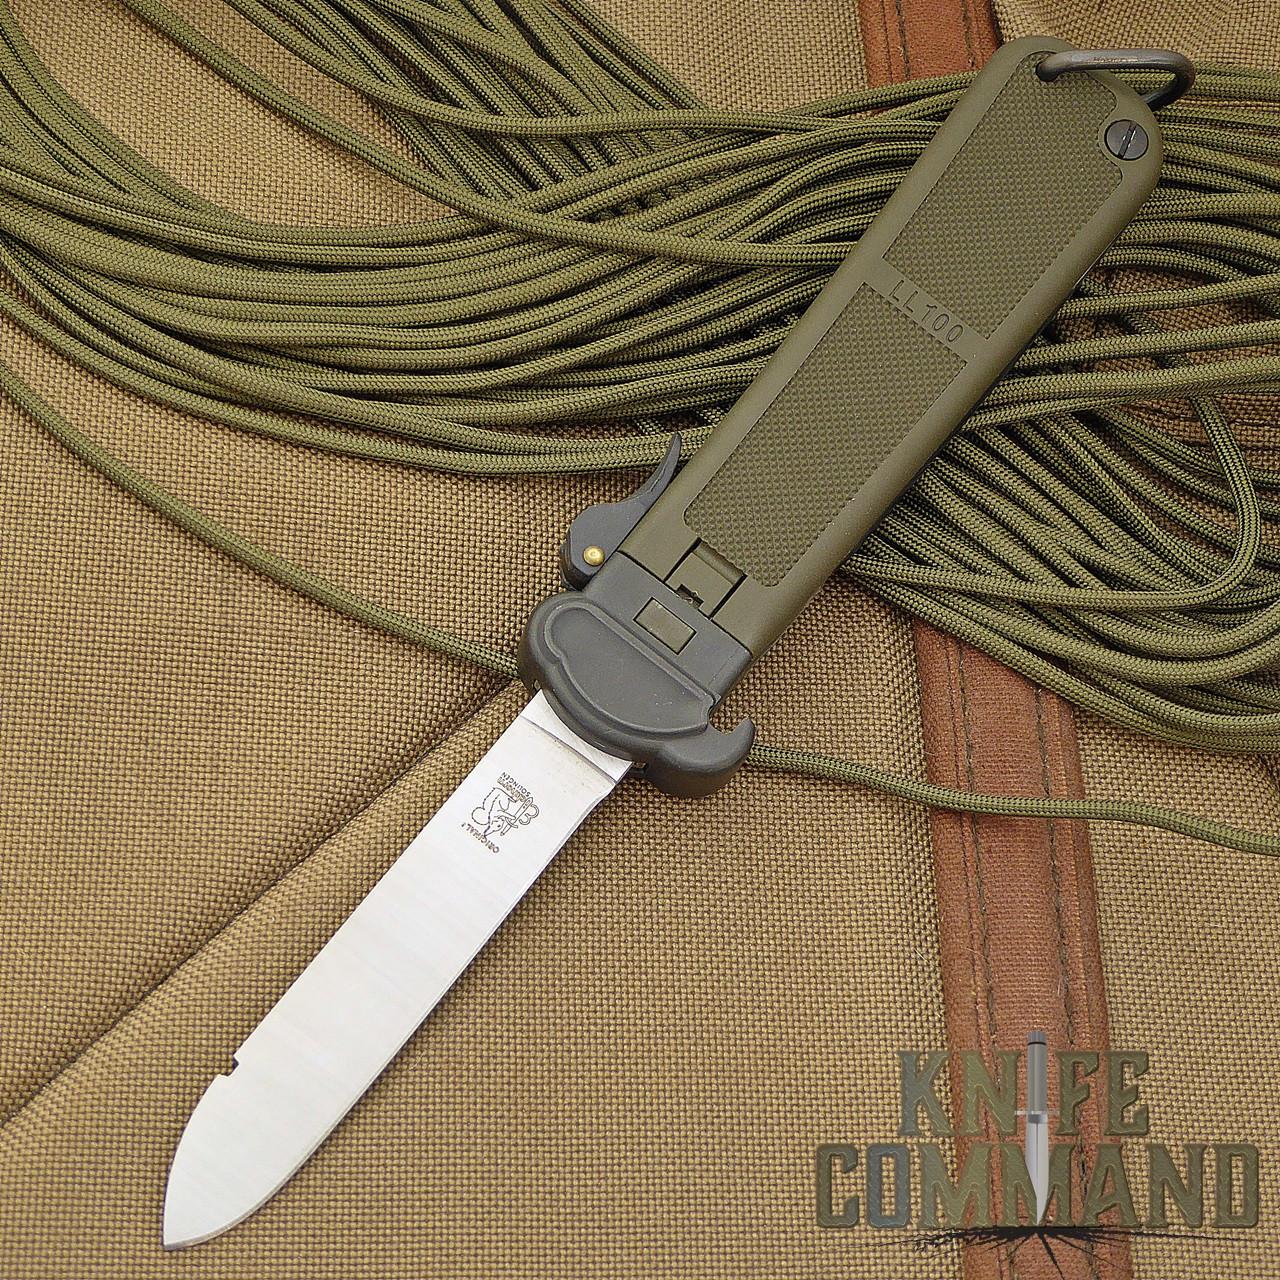 Eickhorn Solingen LL100 Paratrooper Knife.  Updated version of famous LL80 knife.